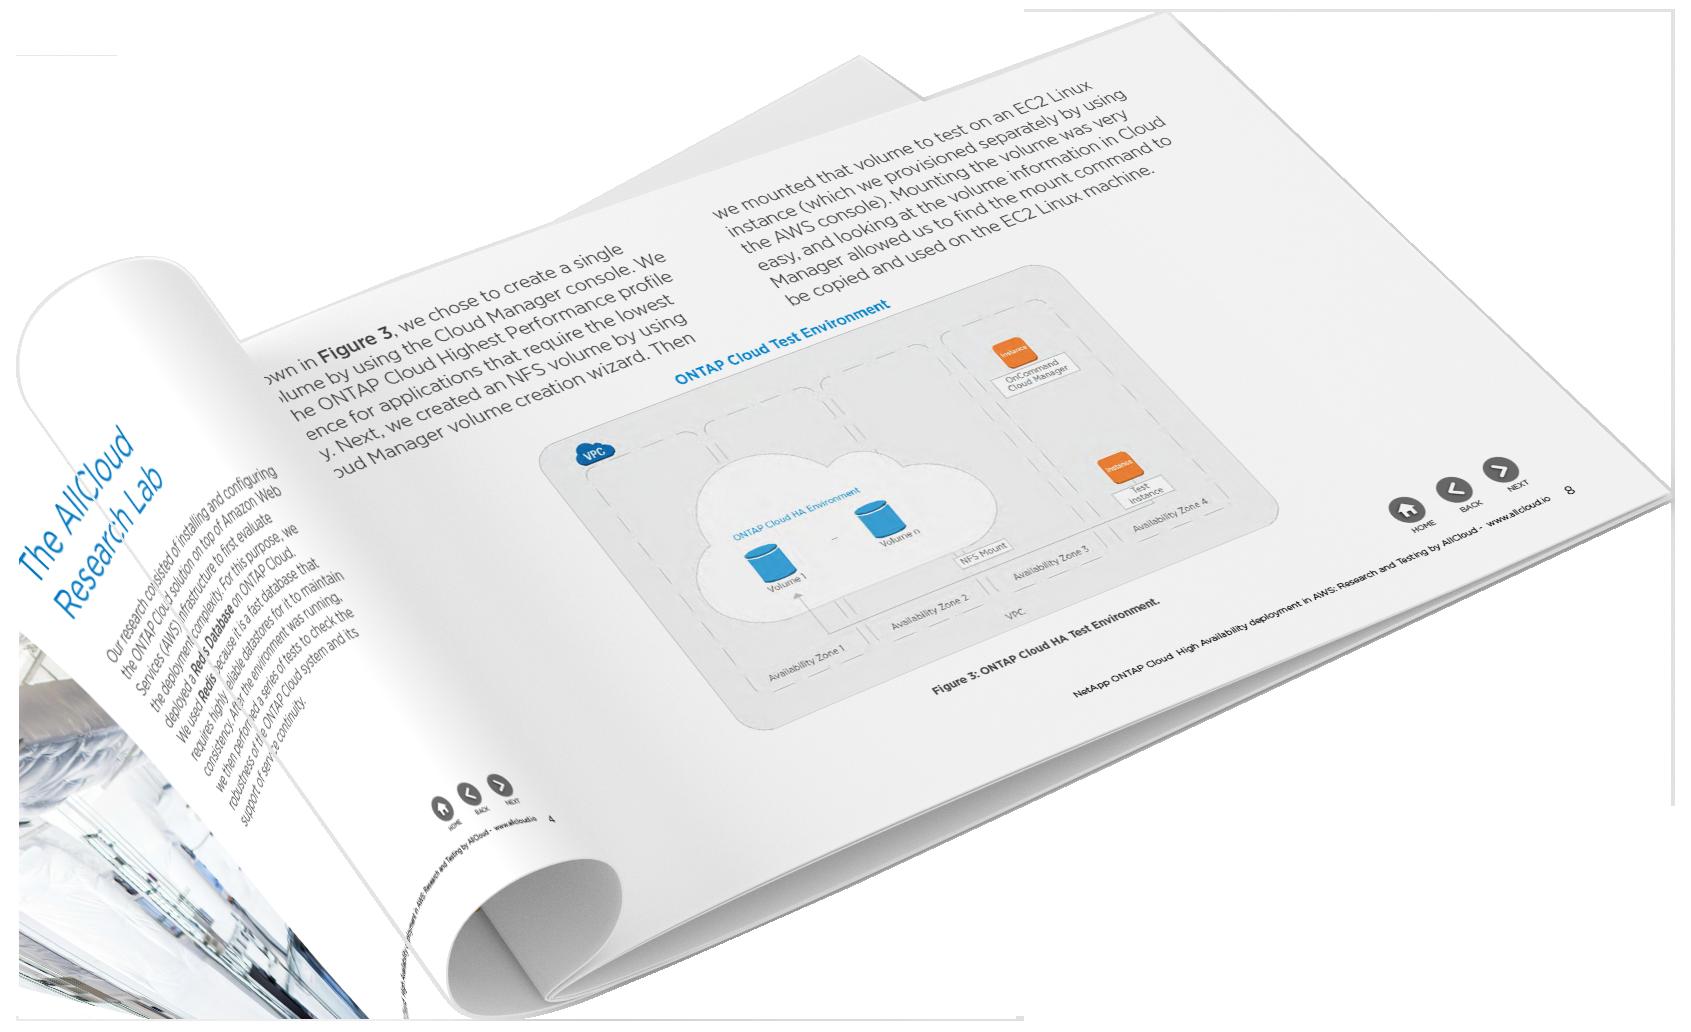 OTC Benchmarking Cloud Data Management Book